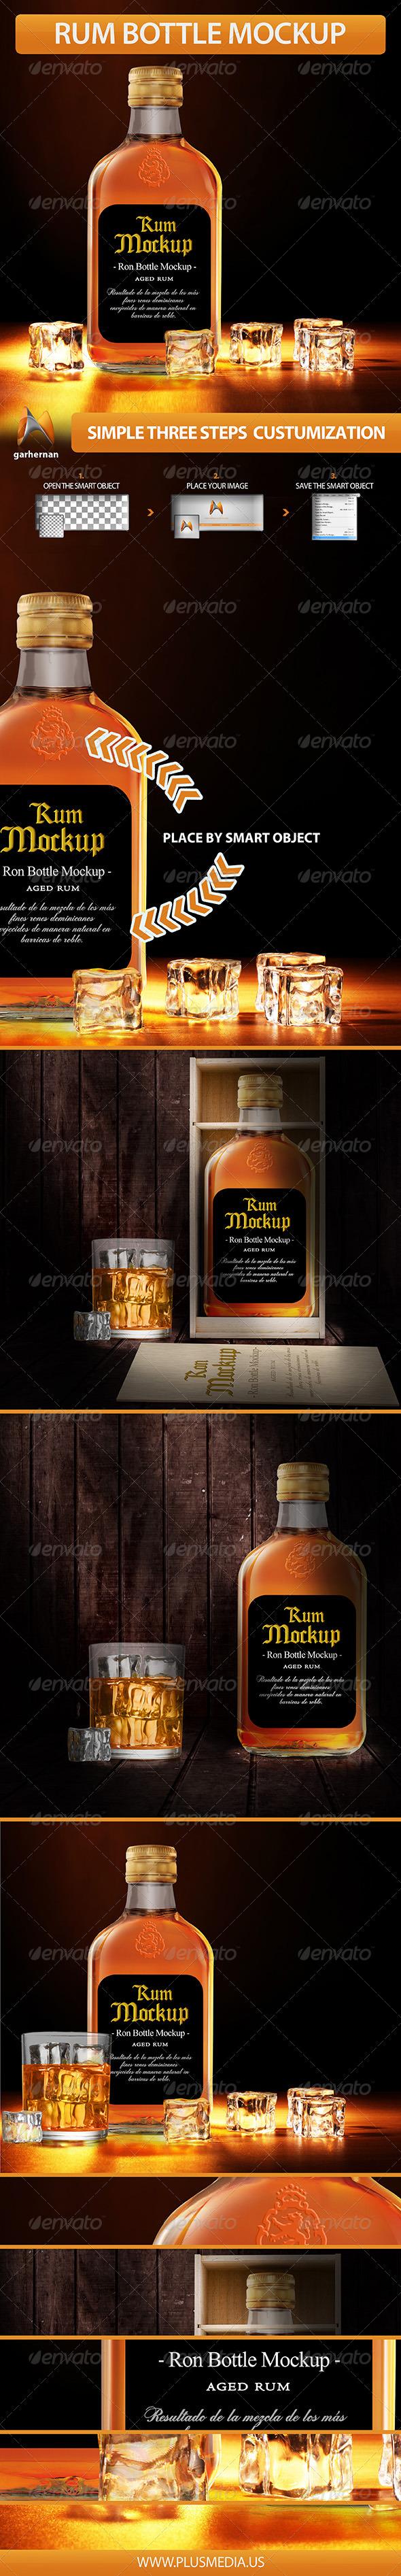 GraphicRiver Rum Bottle Mockup 5756245